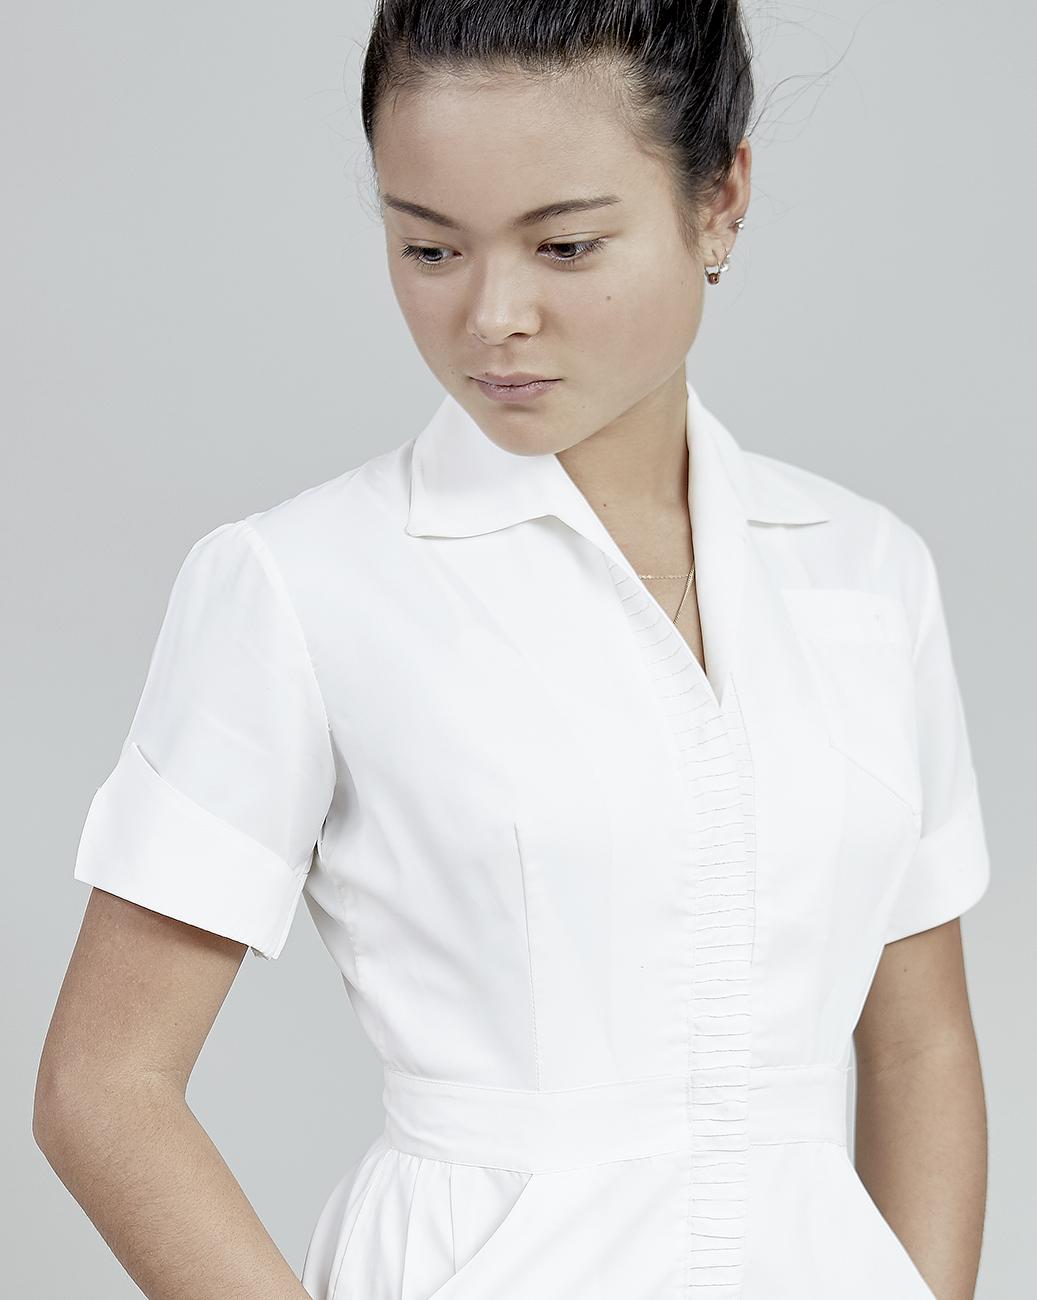 Dollzell_And_Potts_White_Nurse_Dress-003.jpg